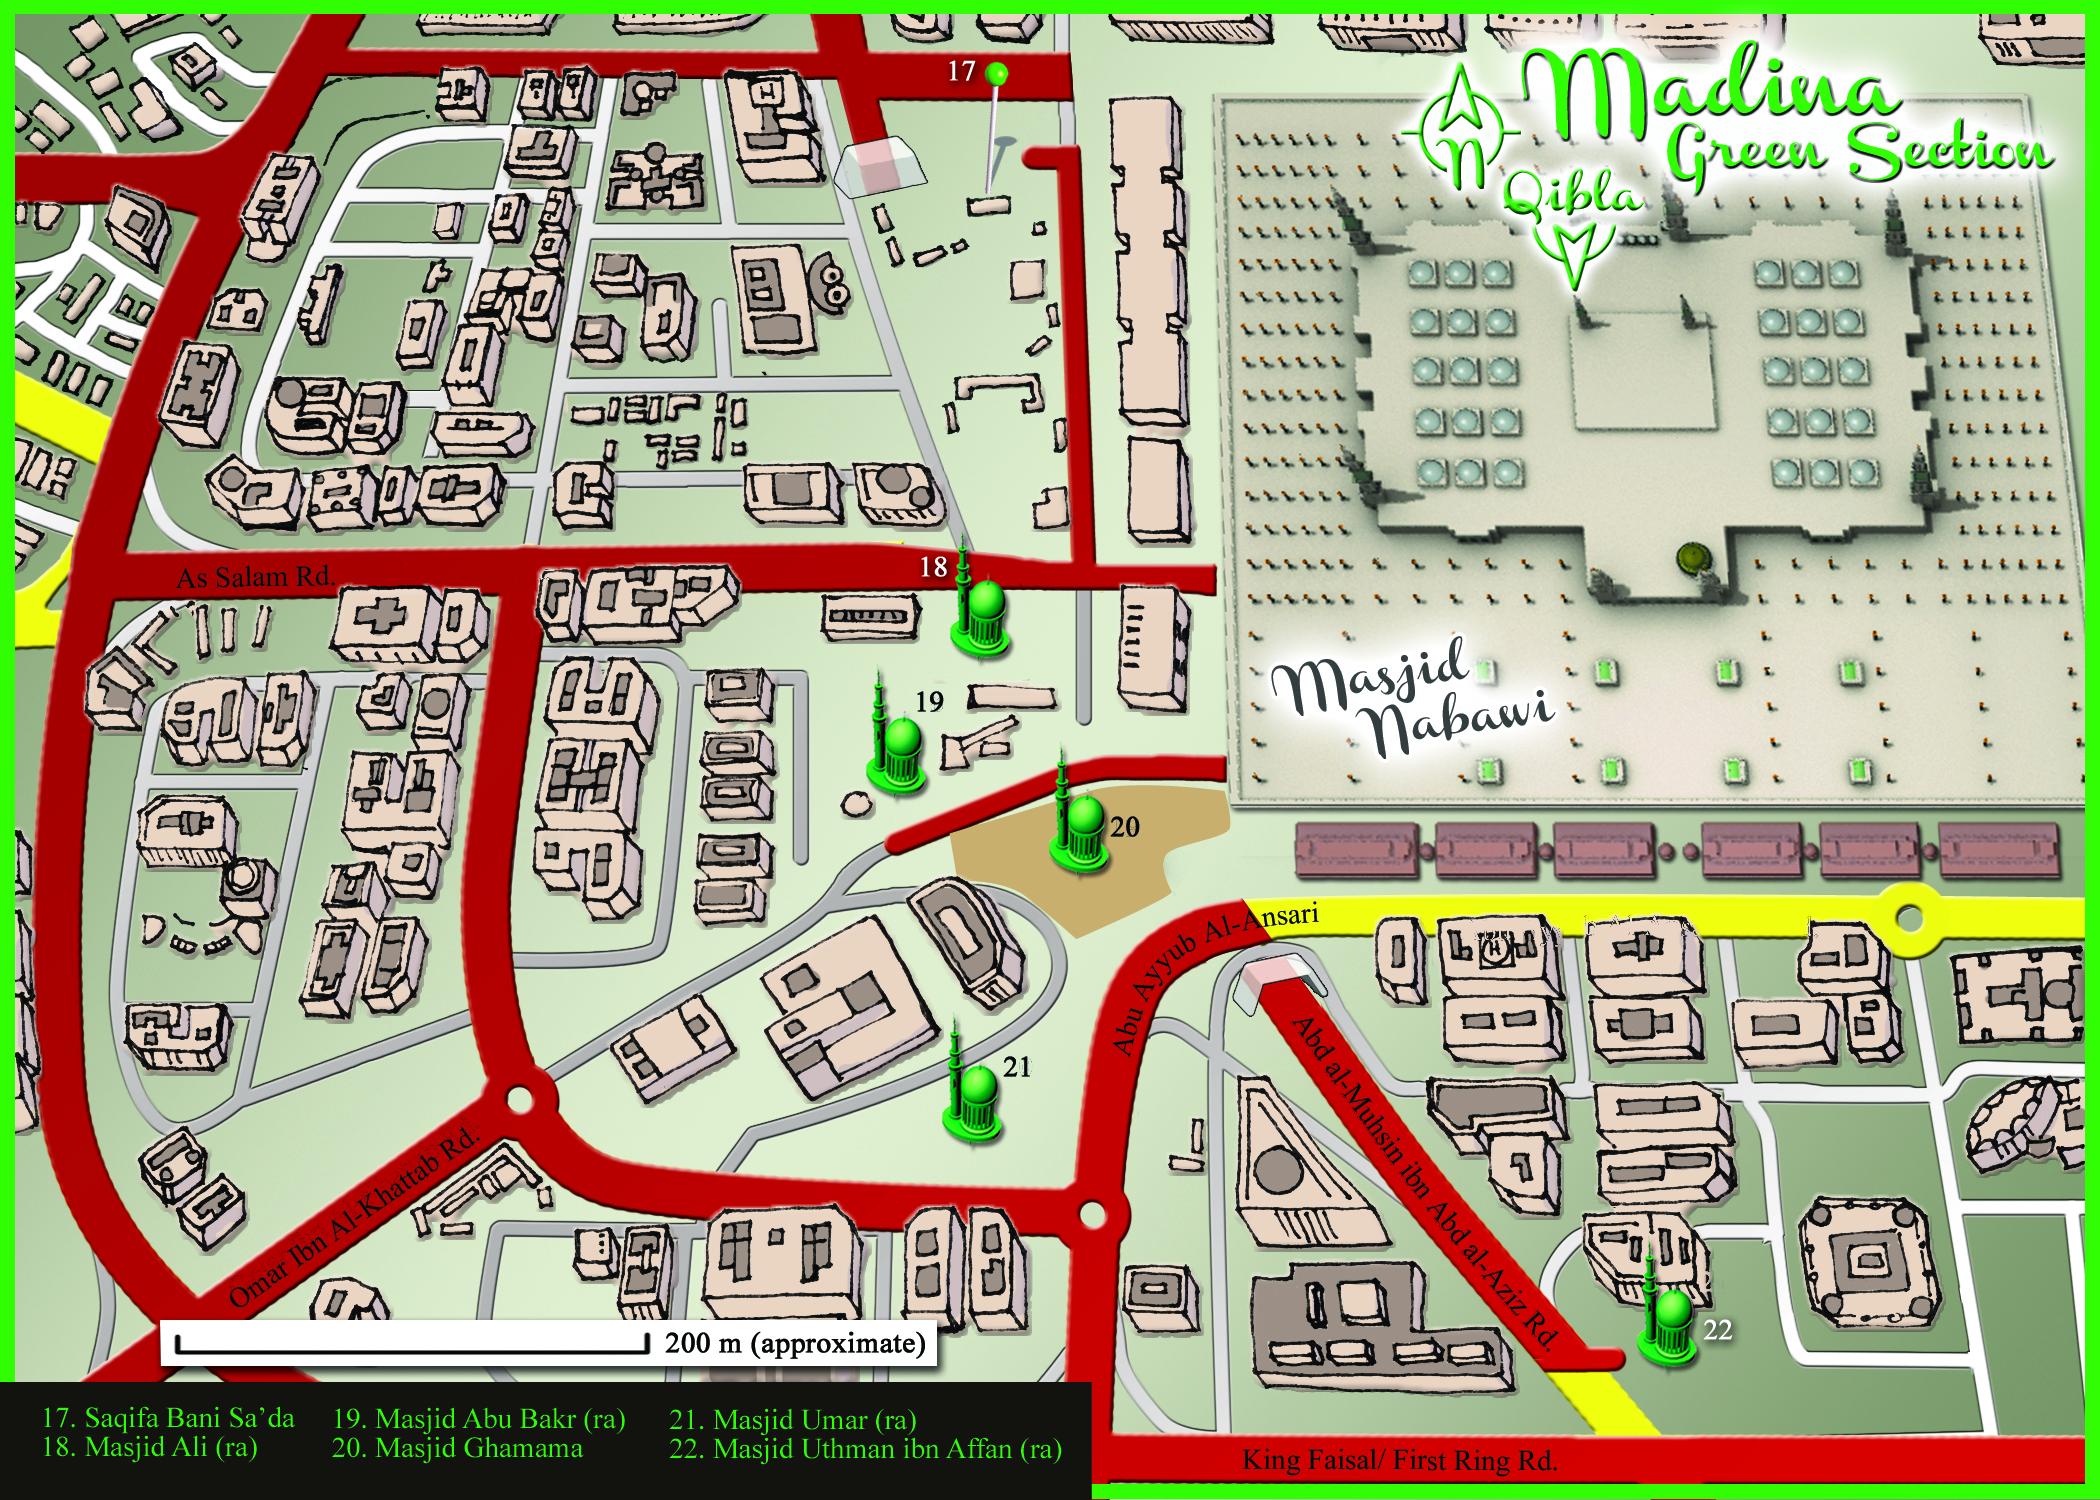 Medina Map: Green Section Detail